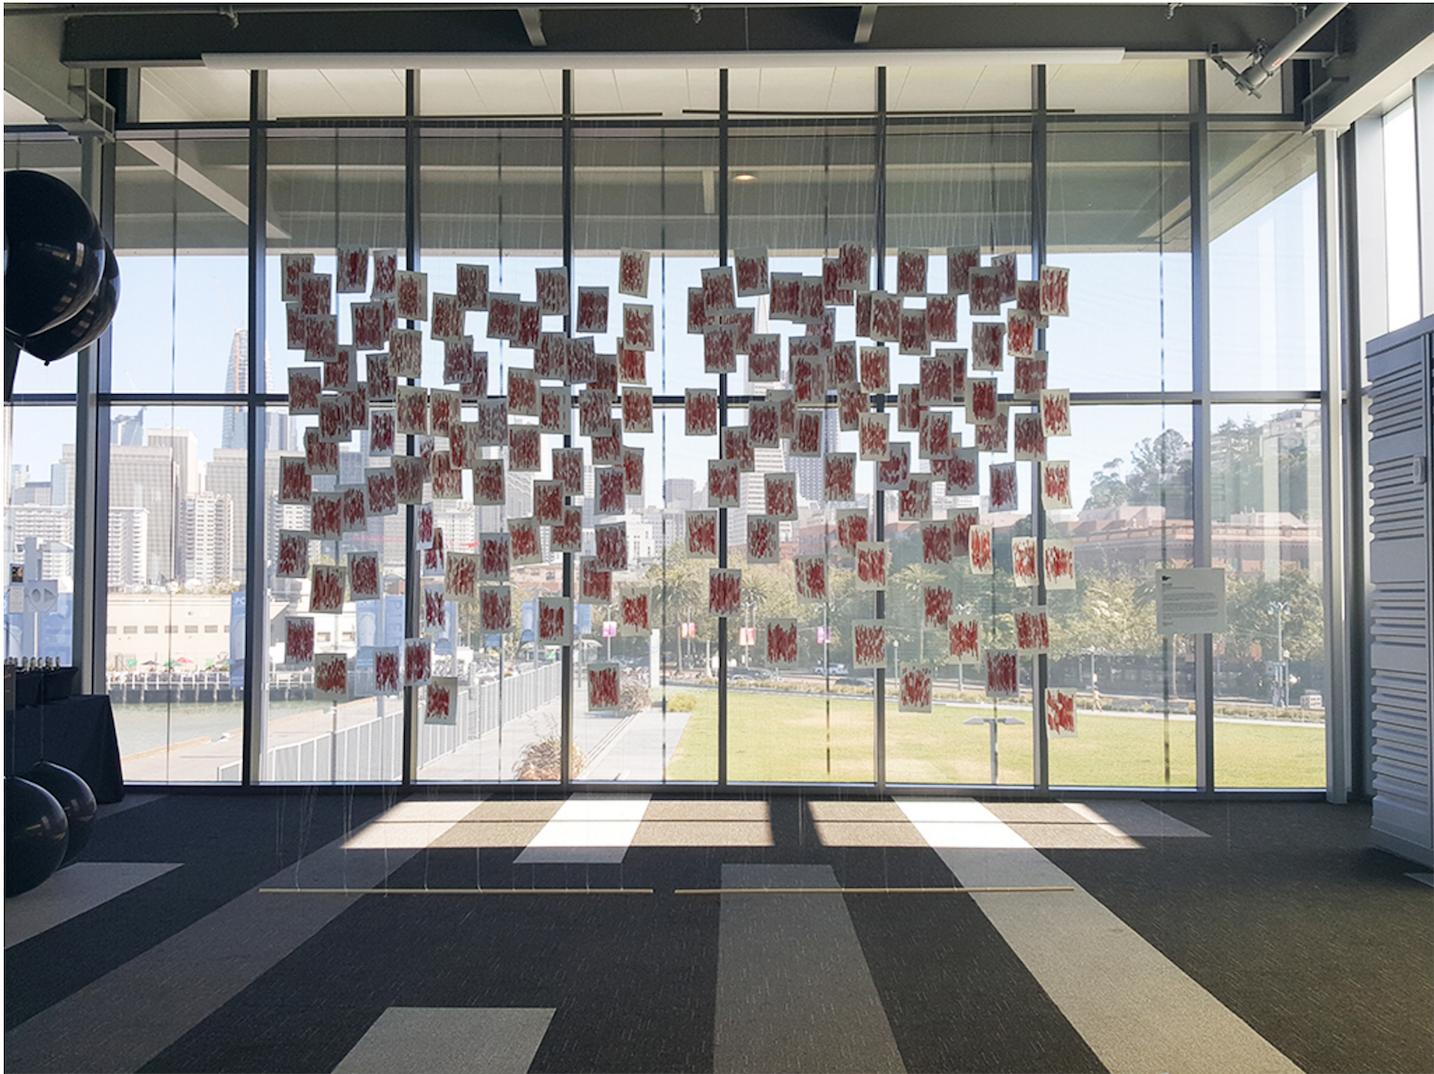 Chloe Bensahel's installation at San Francisco Design Week 2017